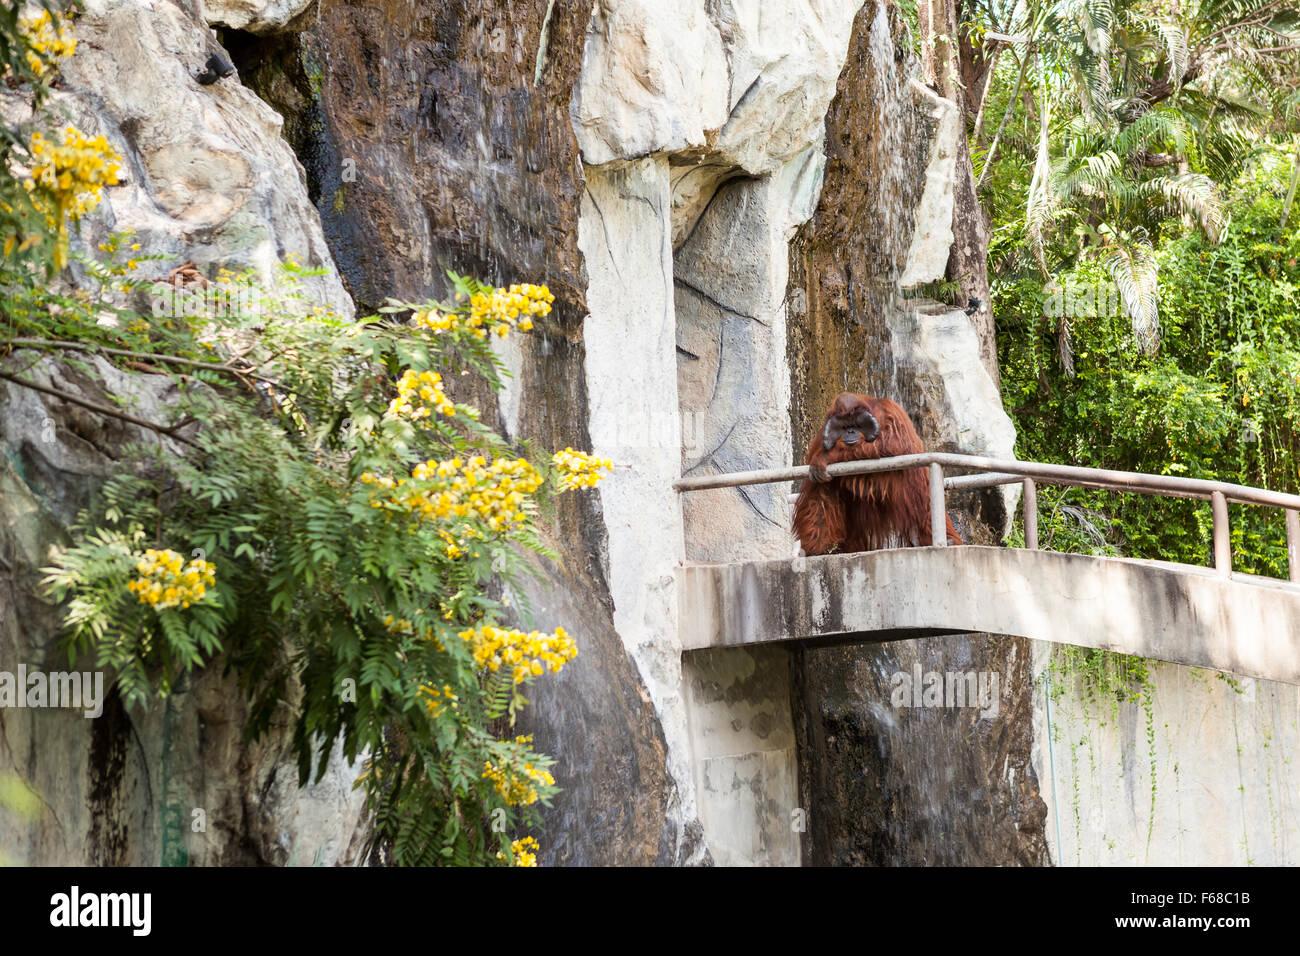 on an concrete walkway is an orangutan Stock Photo